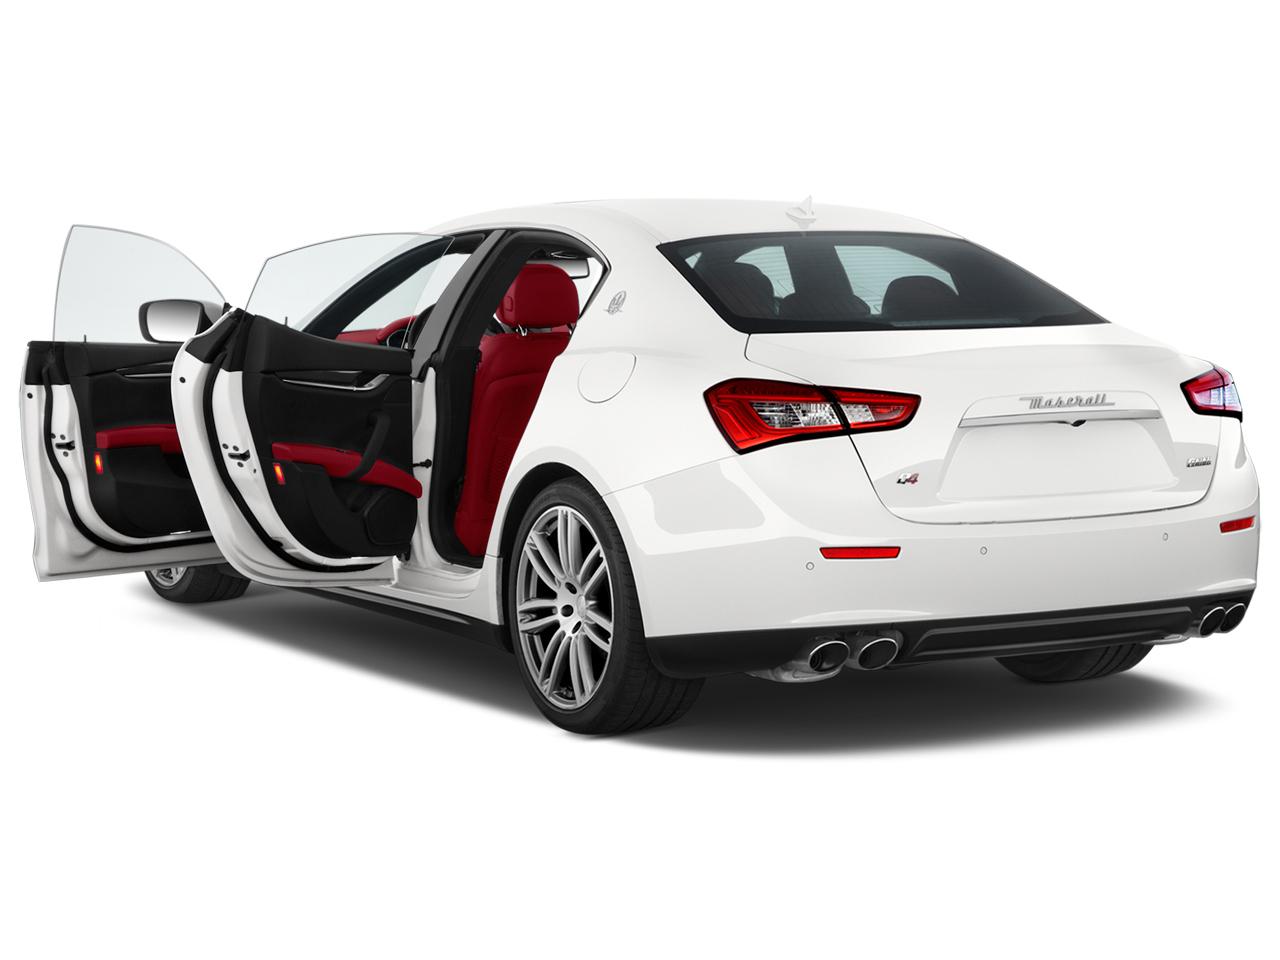 Maserati Ghibli 2019 3.0T V6 S, Saudi Arabia